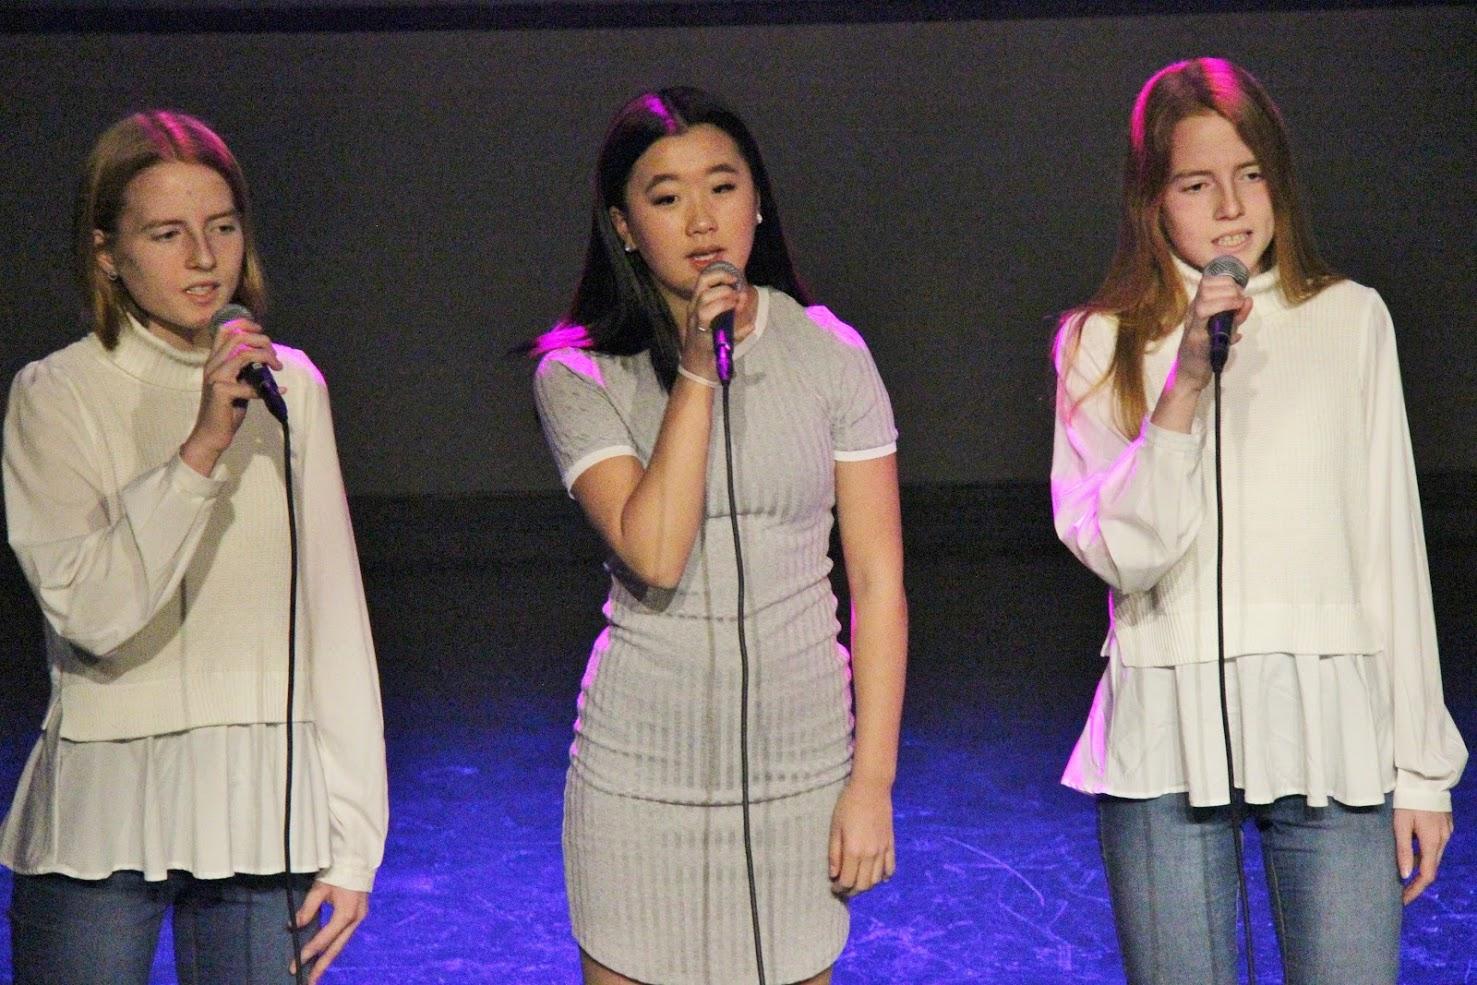 Syngende jenter